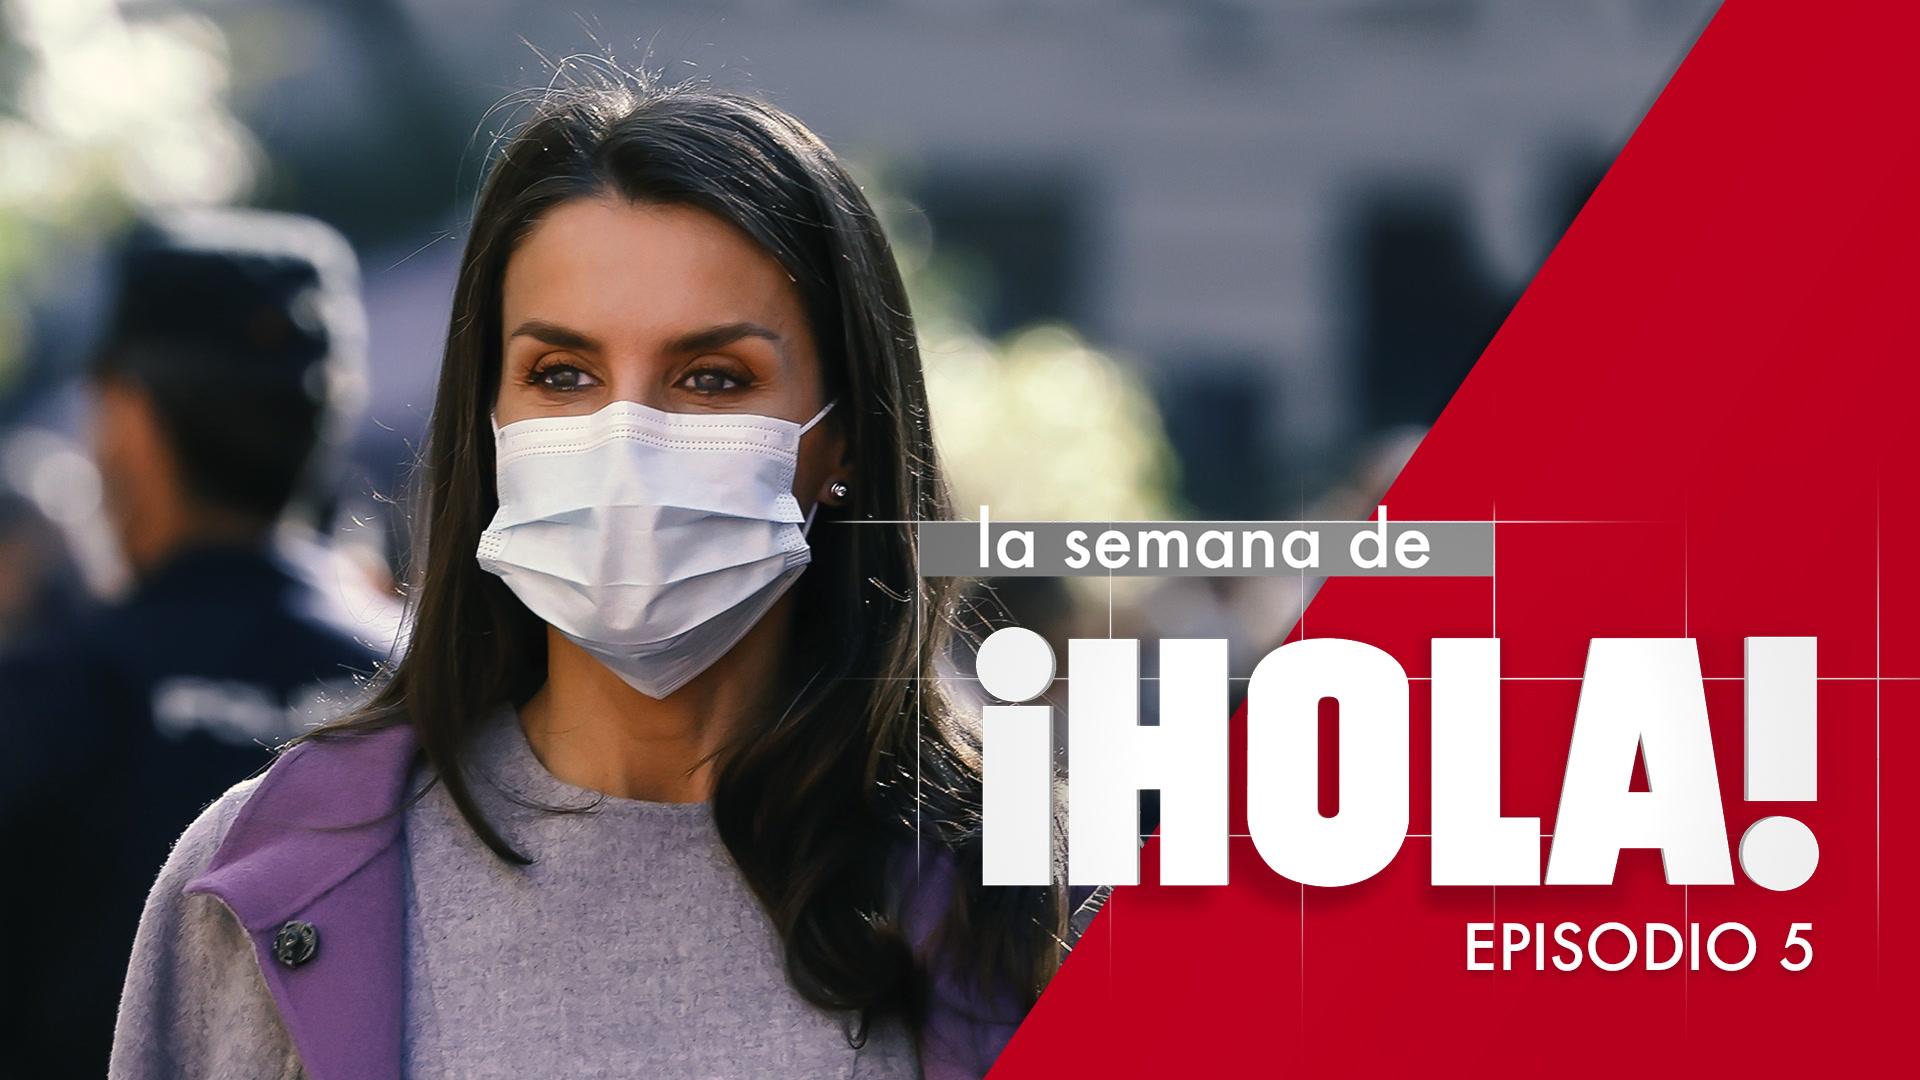 La semana de ¡HOLA! - Episodio 5